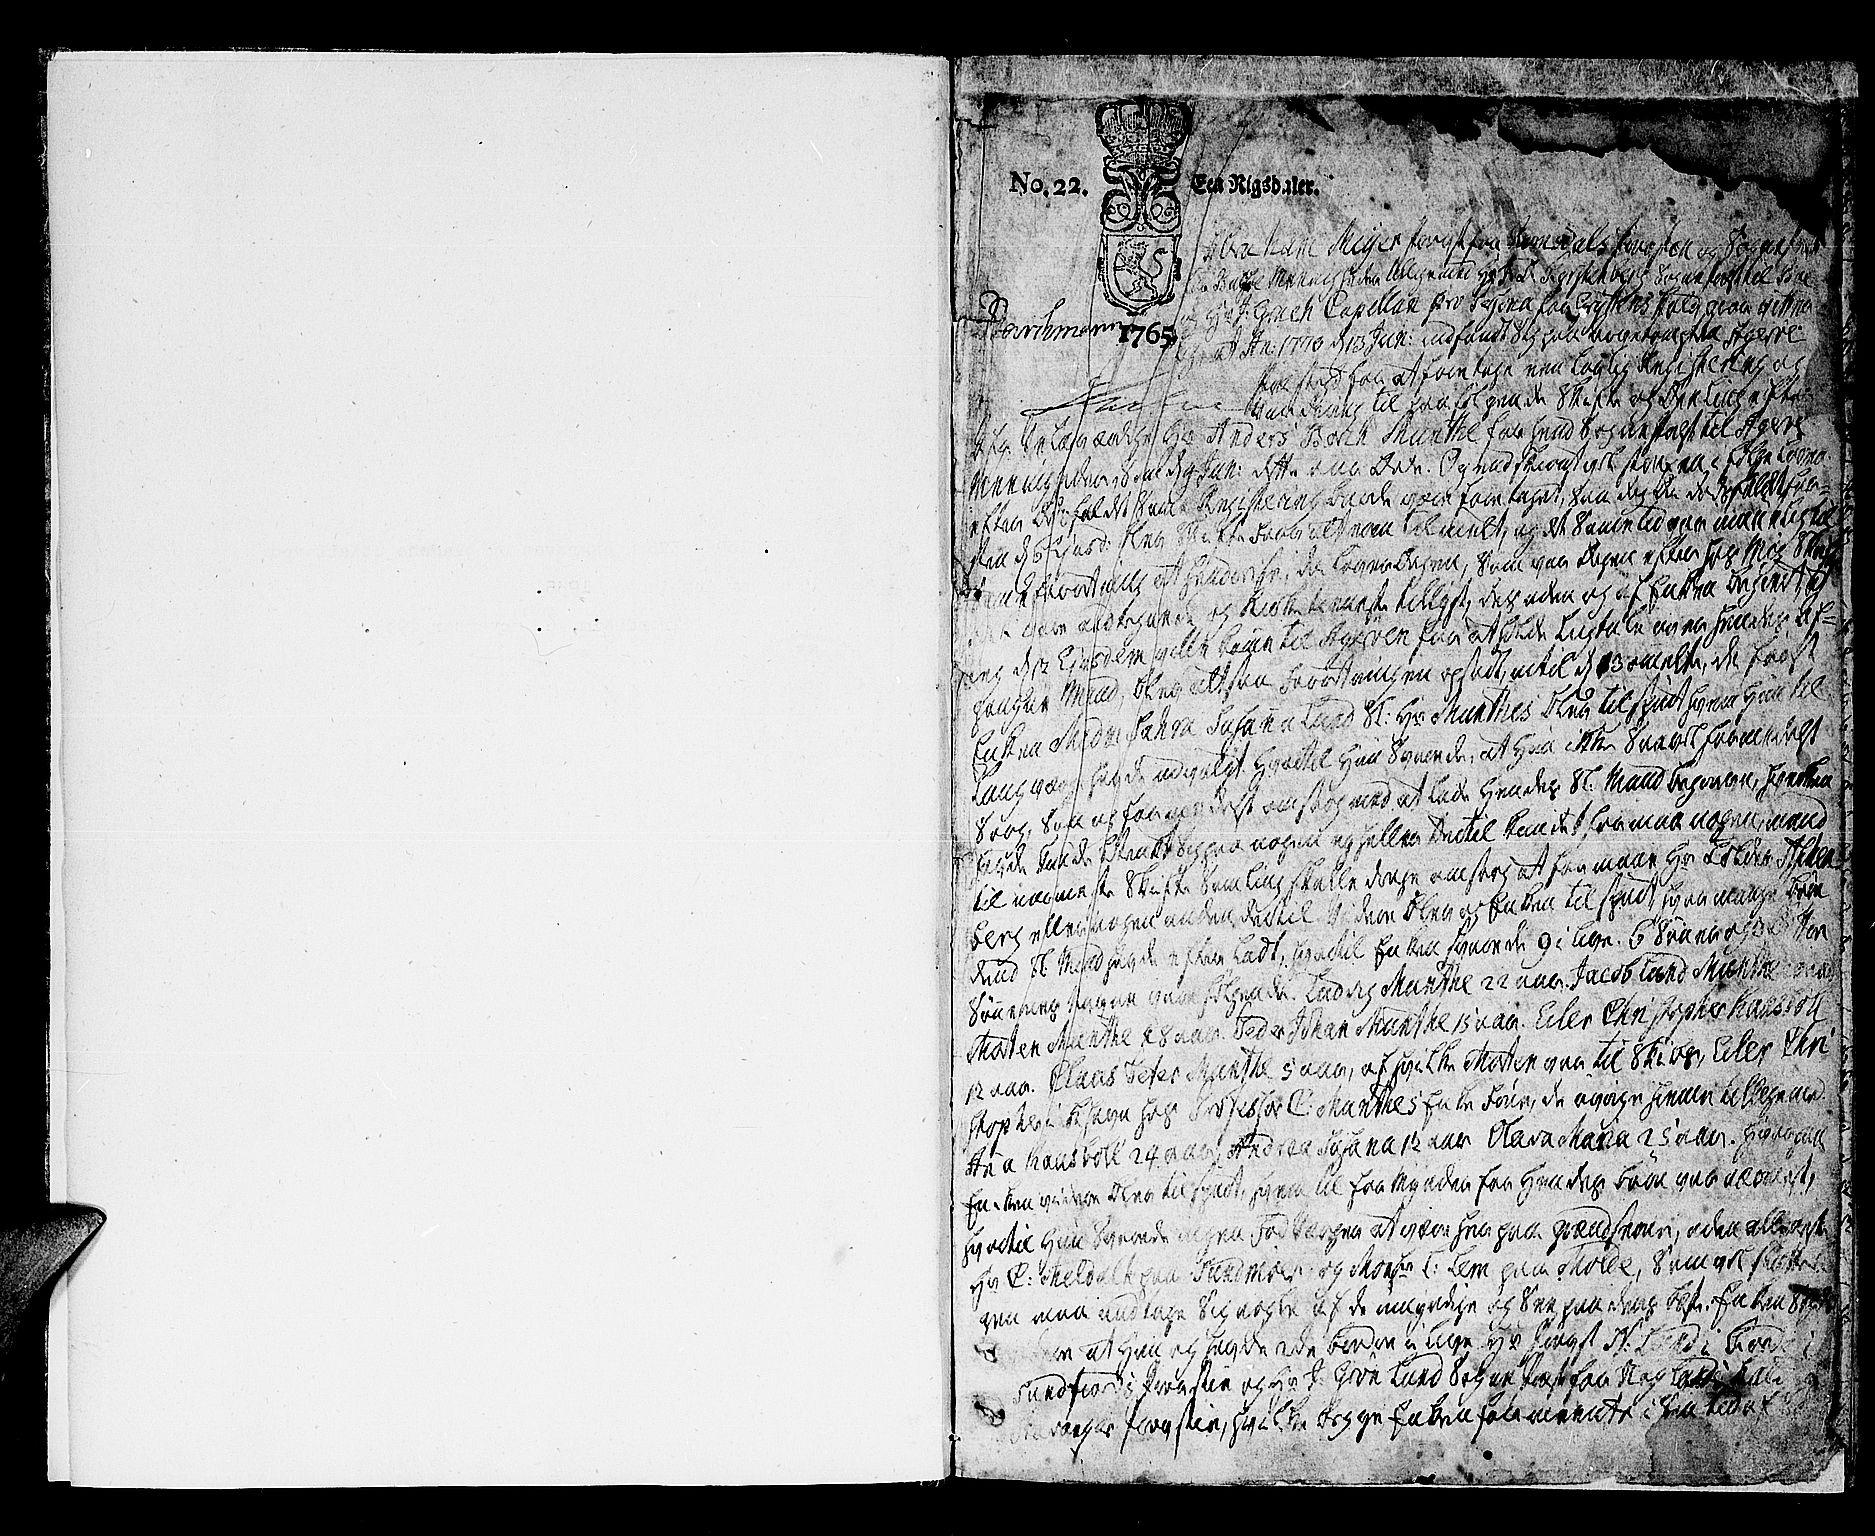 SAT, Romsdal prosti, I/I1/L0005: Skifteprotokoll for Romsdal prosti, 1765-1816, s. 0b-1a